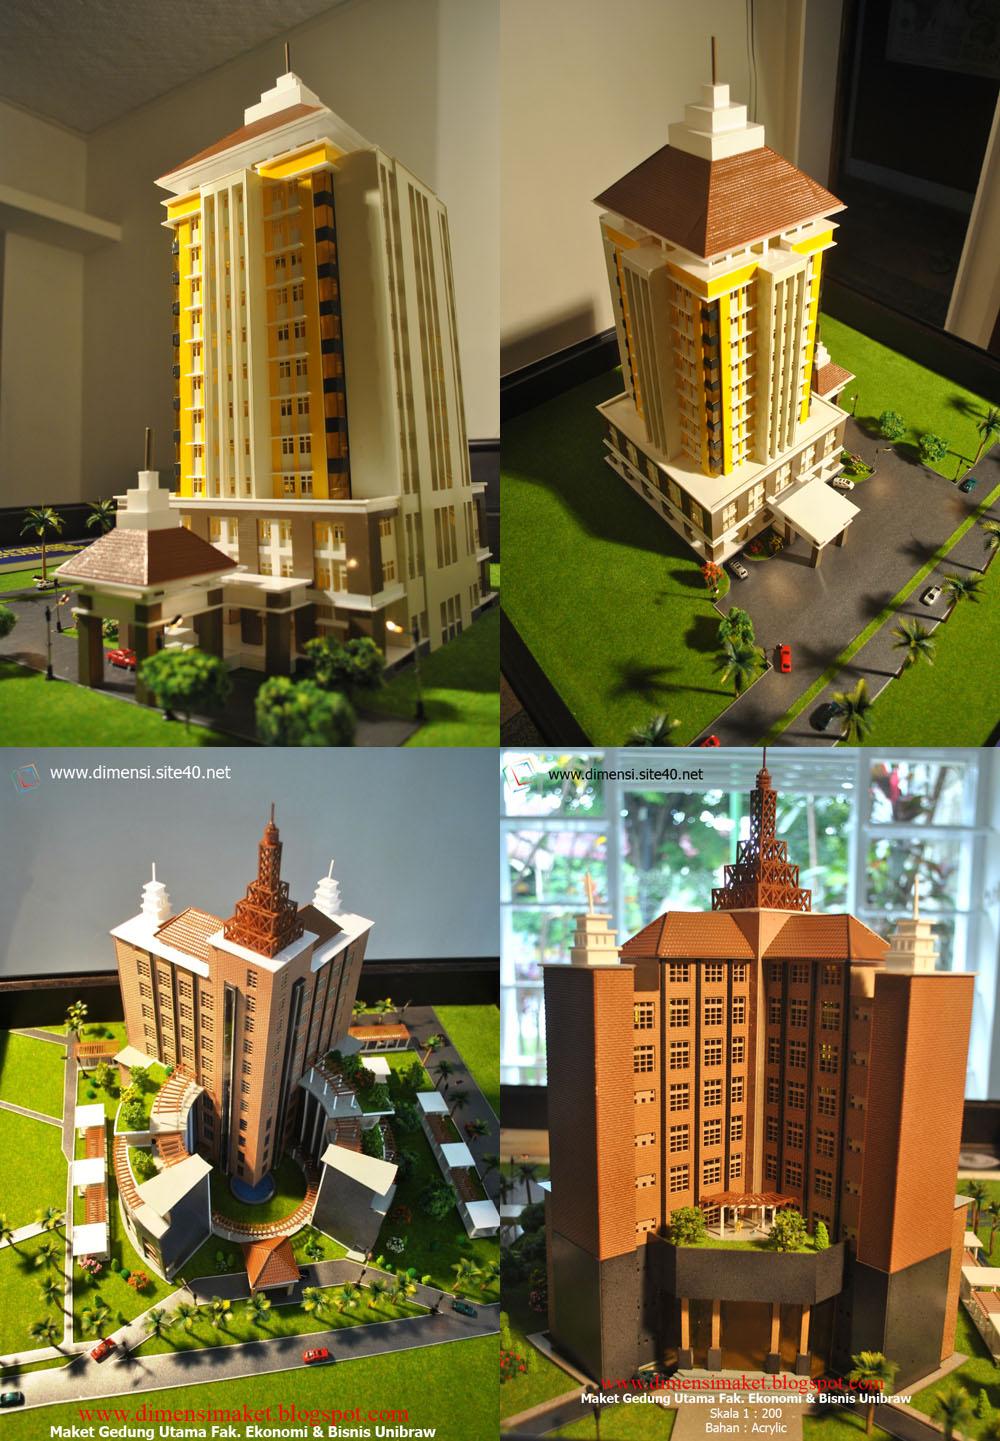 Pameran Teknik Arsitektur UNINDRA PGRI Maket Miniatur ...